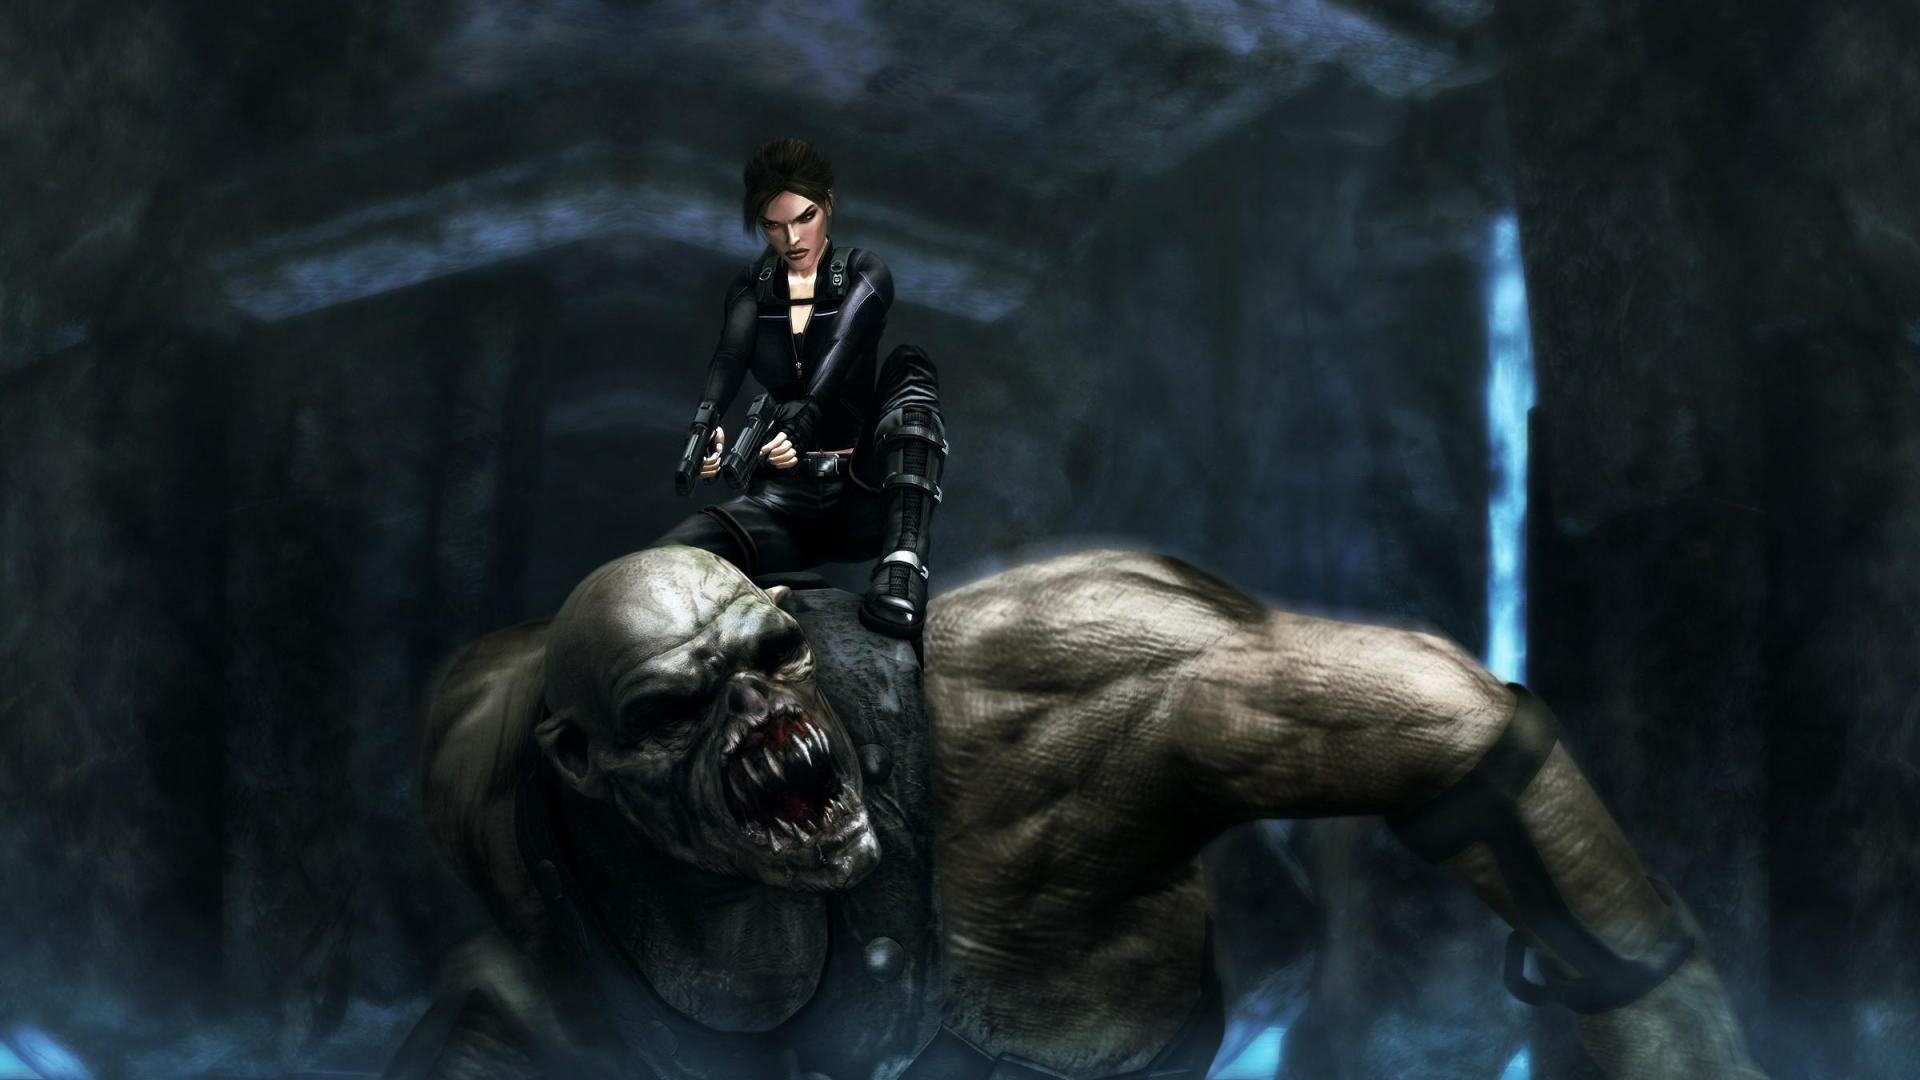 Lara croft monster images nackt scene